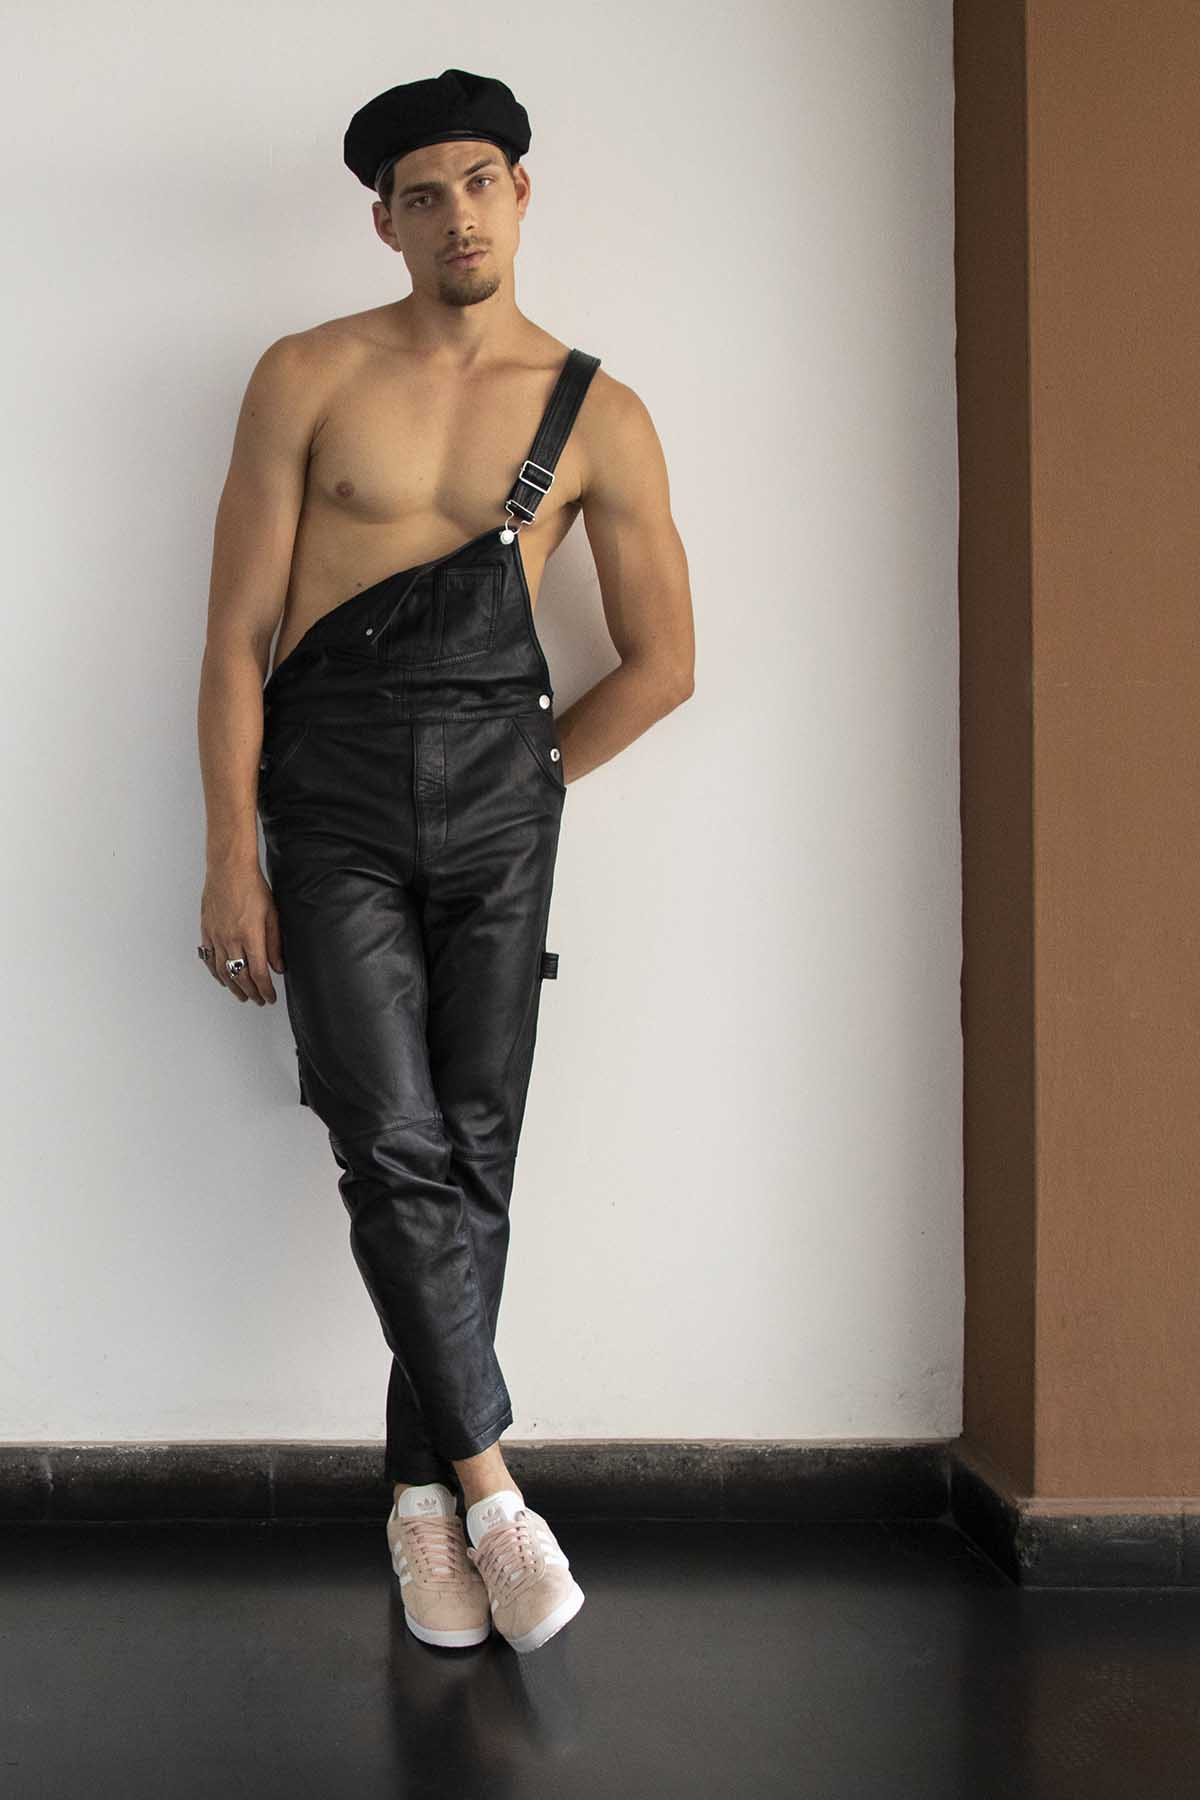 Gleiderson Gasparrini by Cesar Mansilla Sailer for Brazilian Male Model